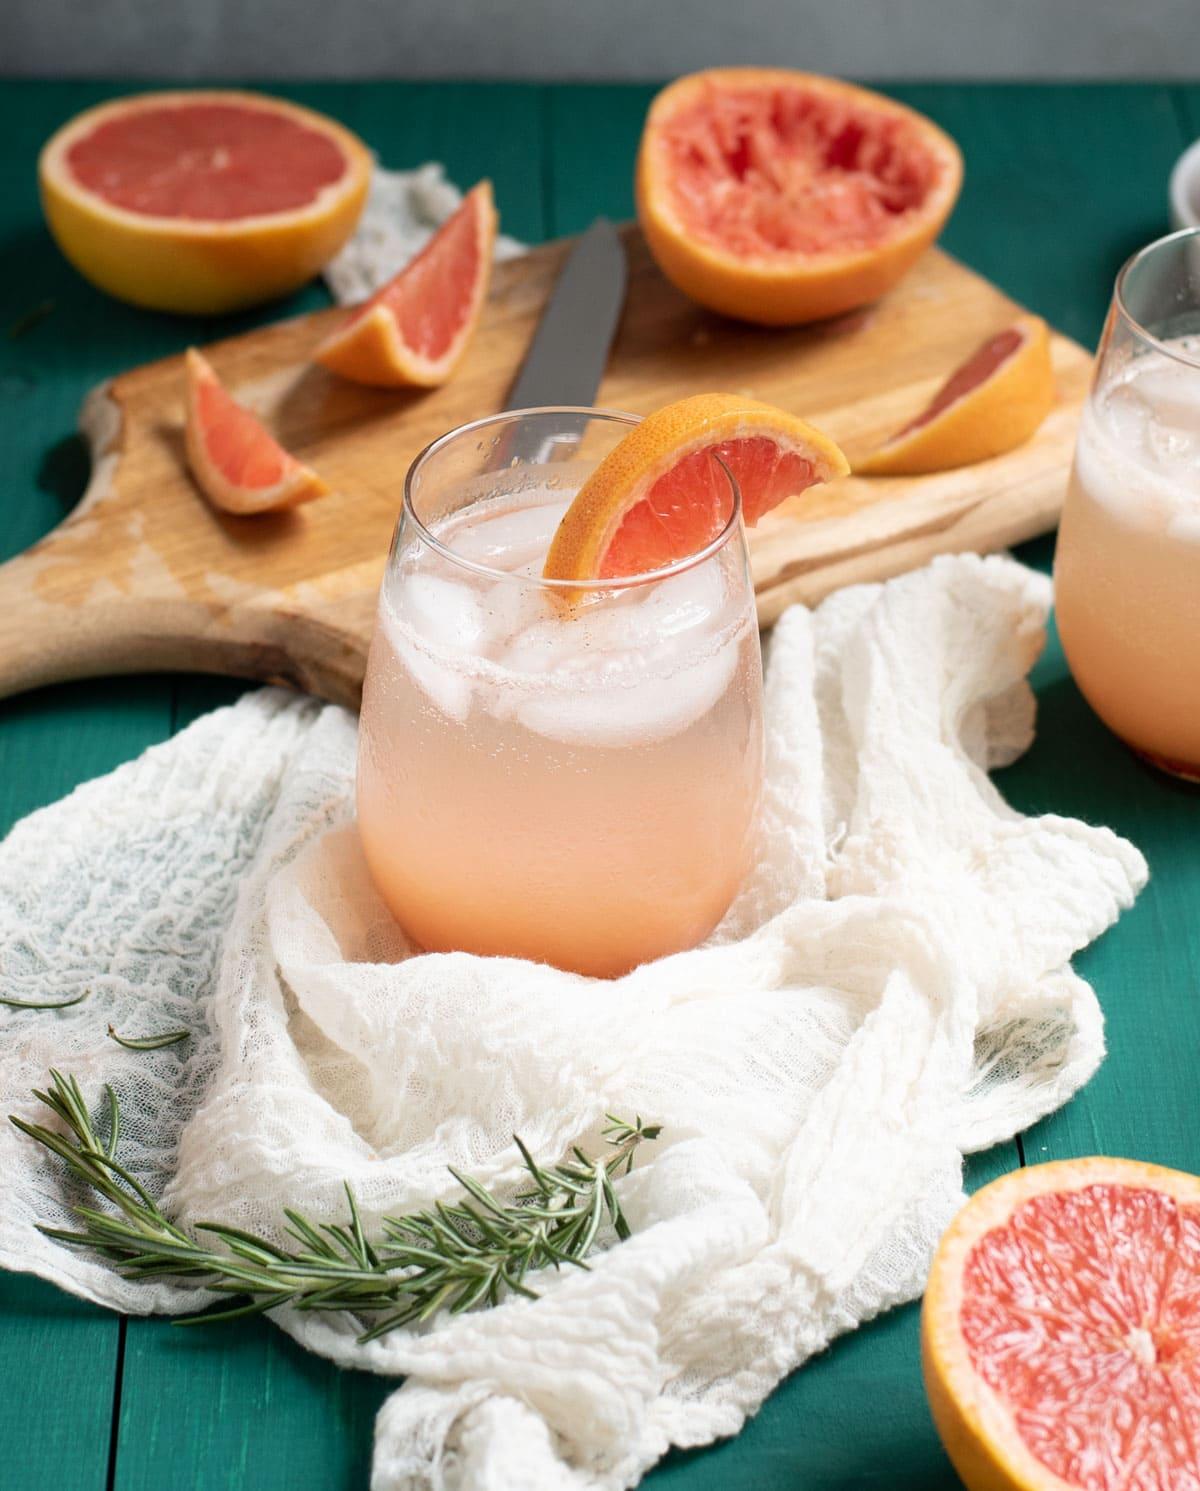 Rosemary grapefruit mocktail with grapefruit garnish